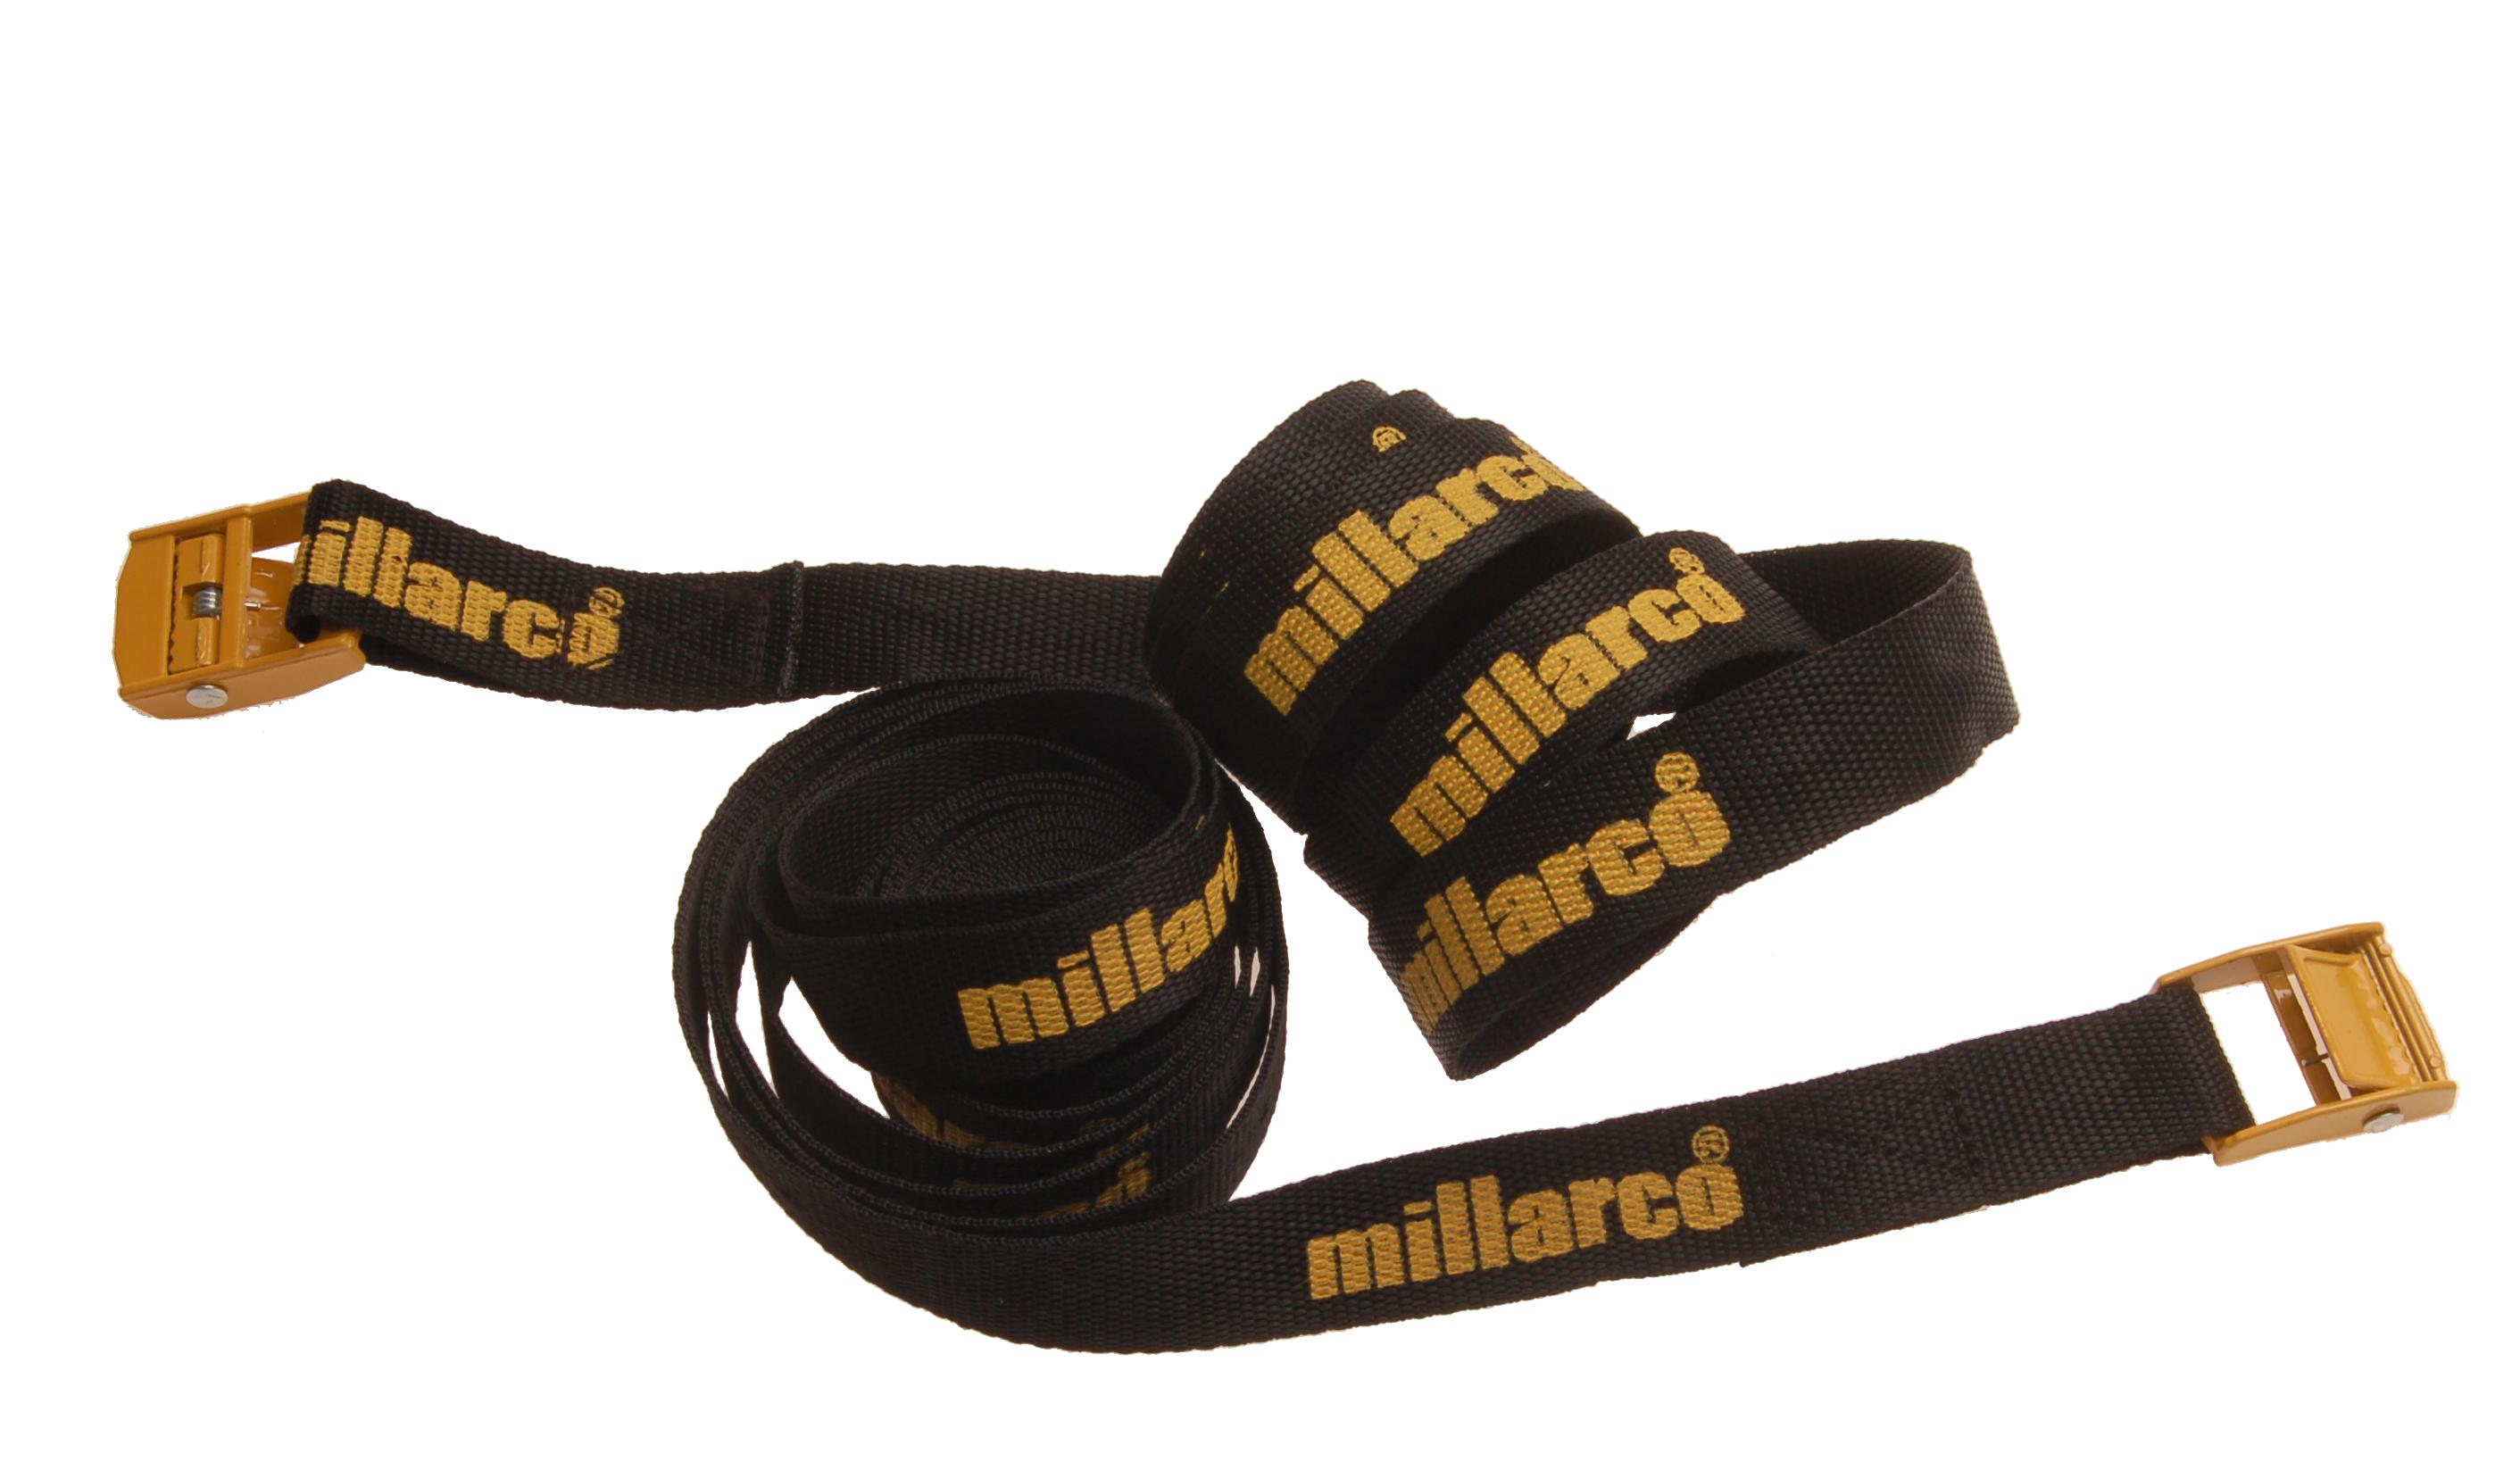 Millarco Bagagefastspænder 3,0 m. - 2 stk.